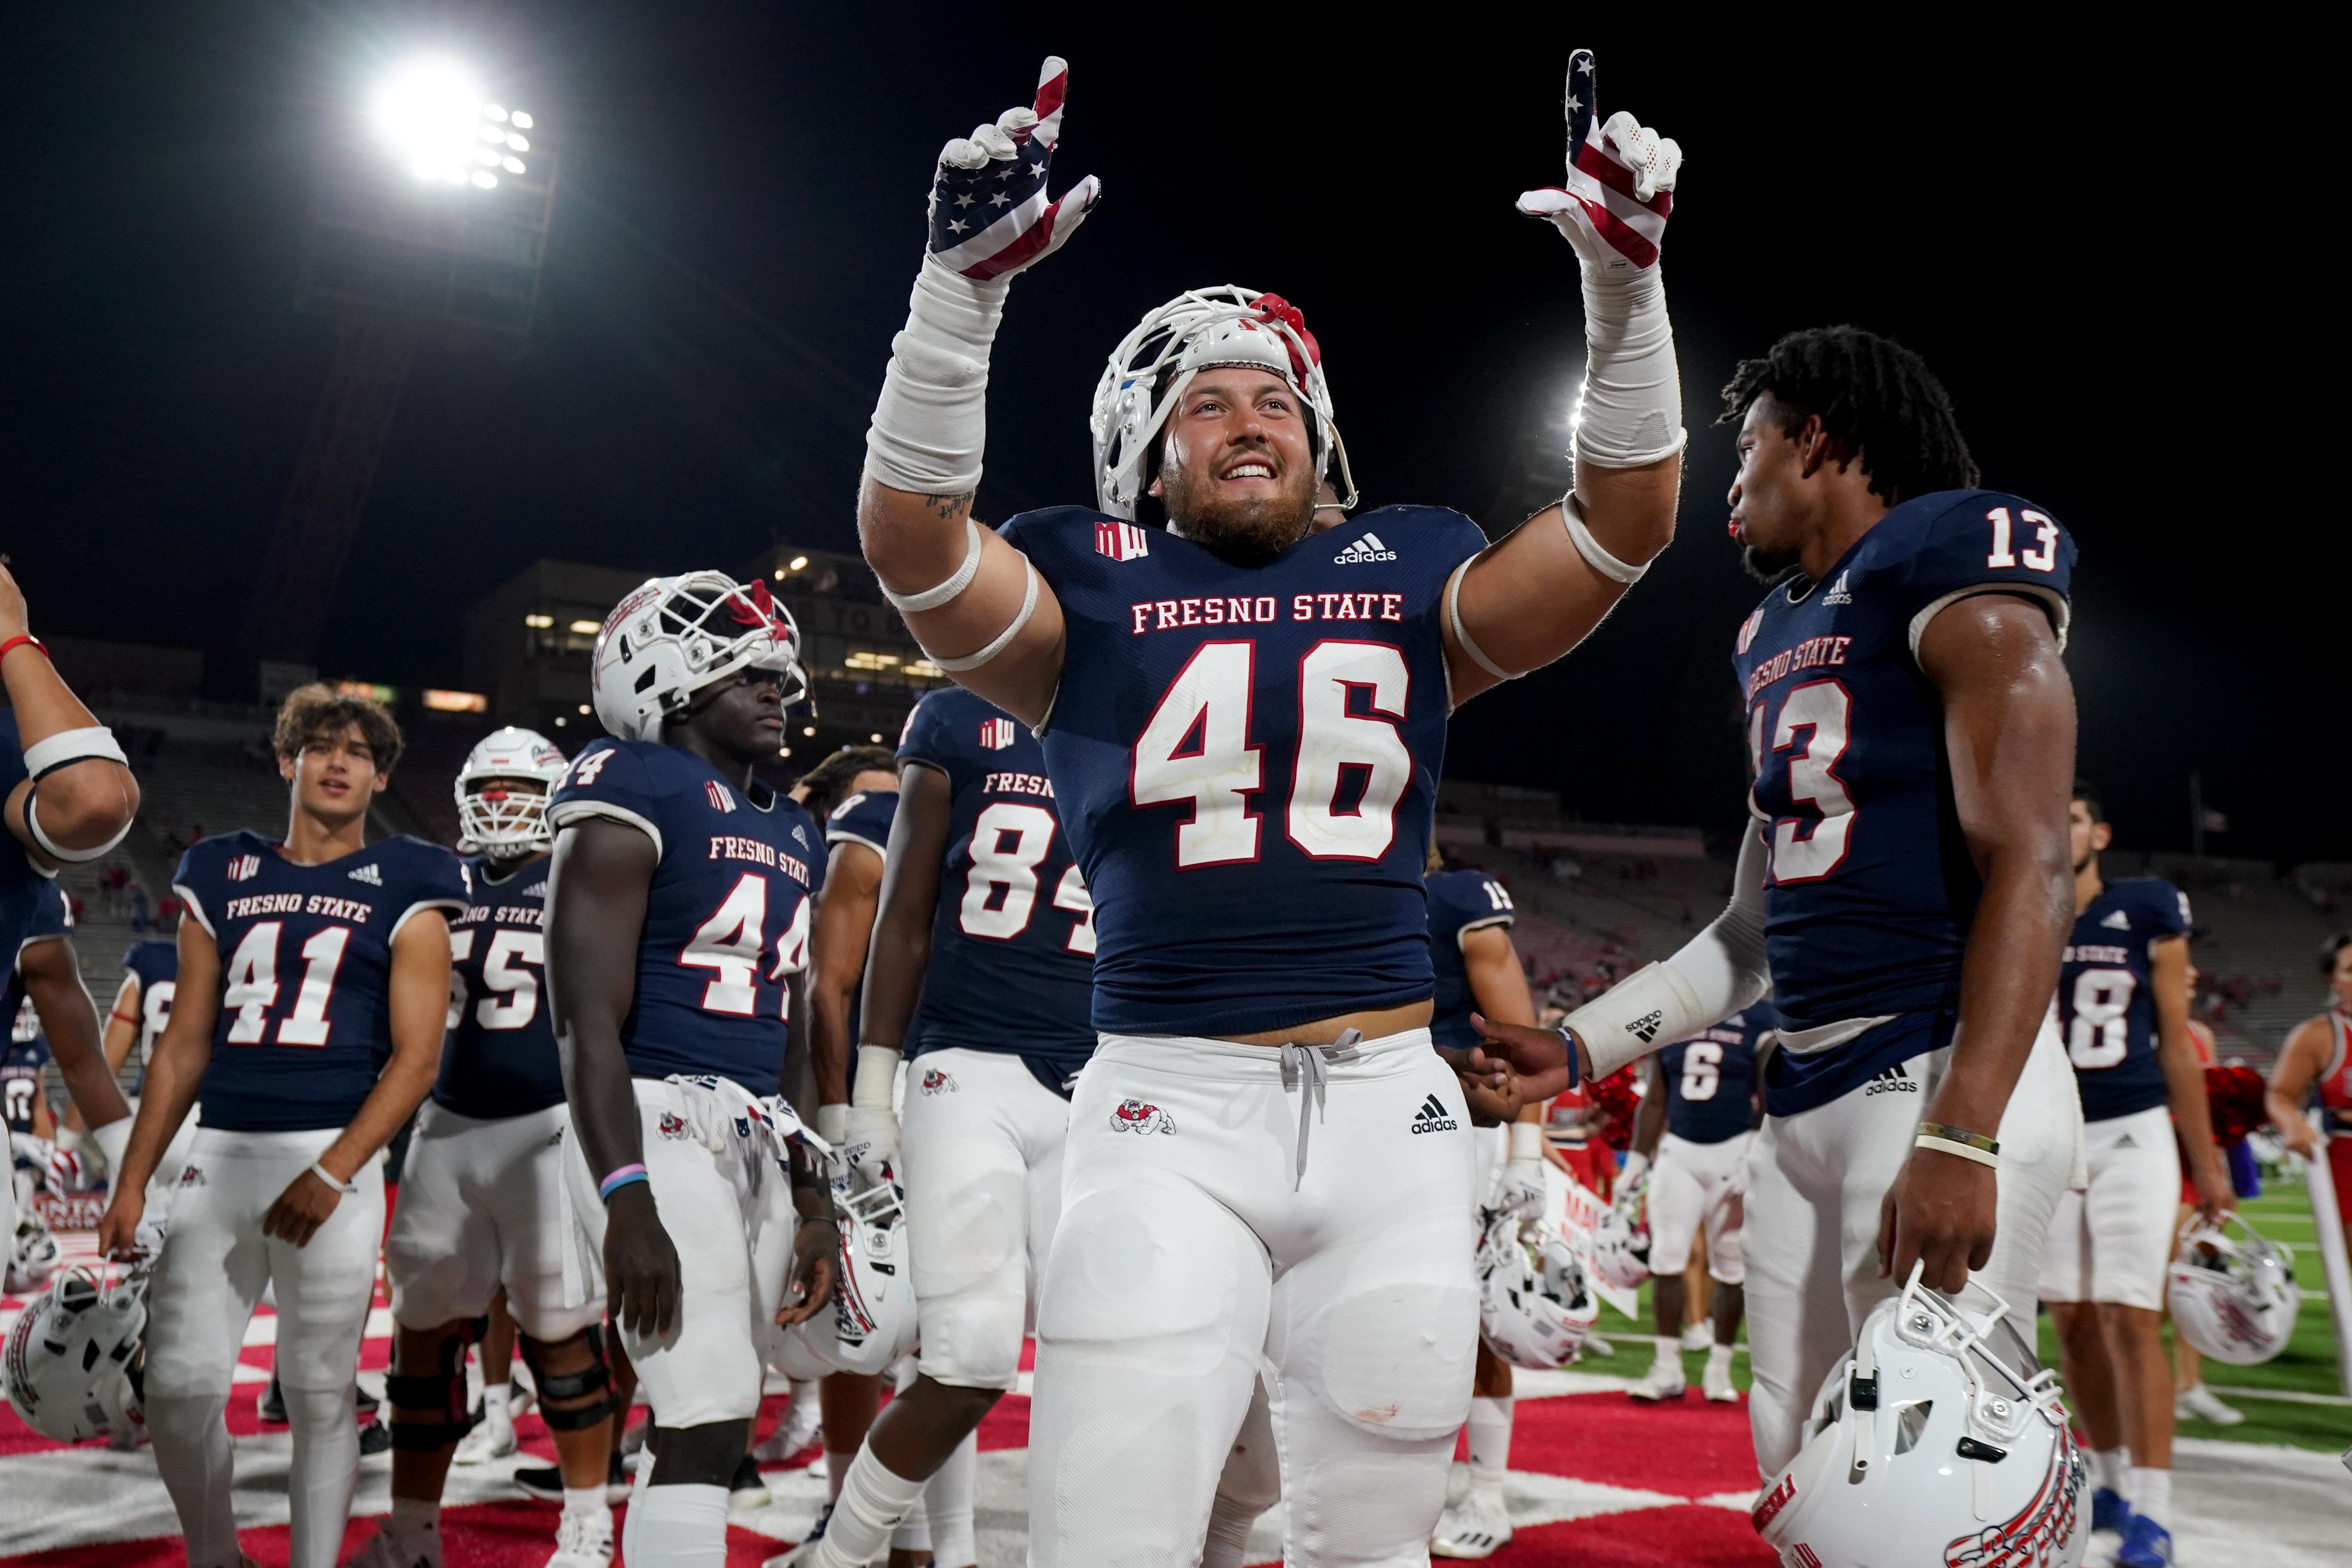 NCAA Football: Cal. Poly - SLO at Fresno State